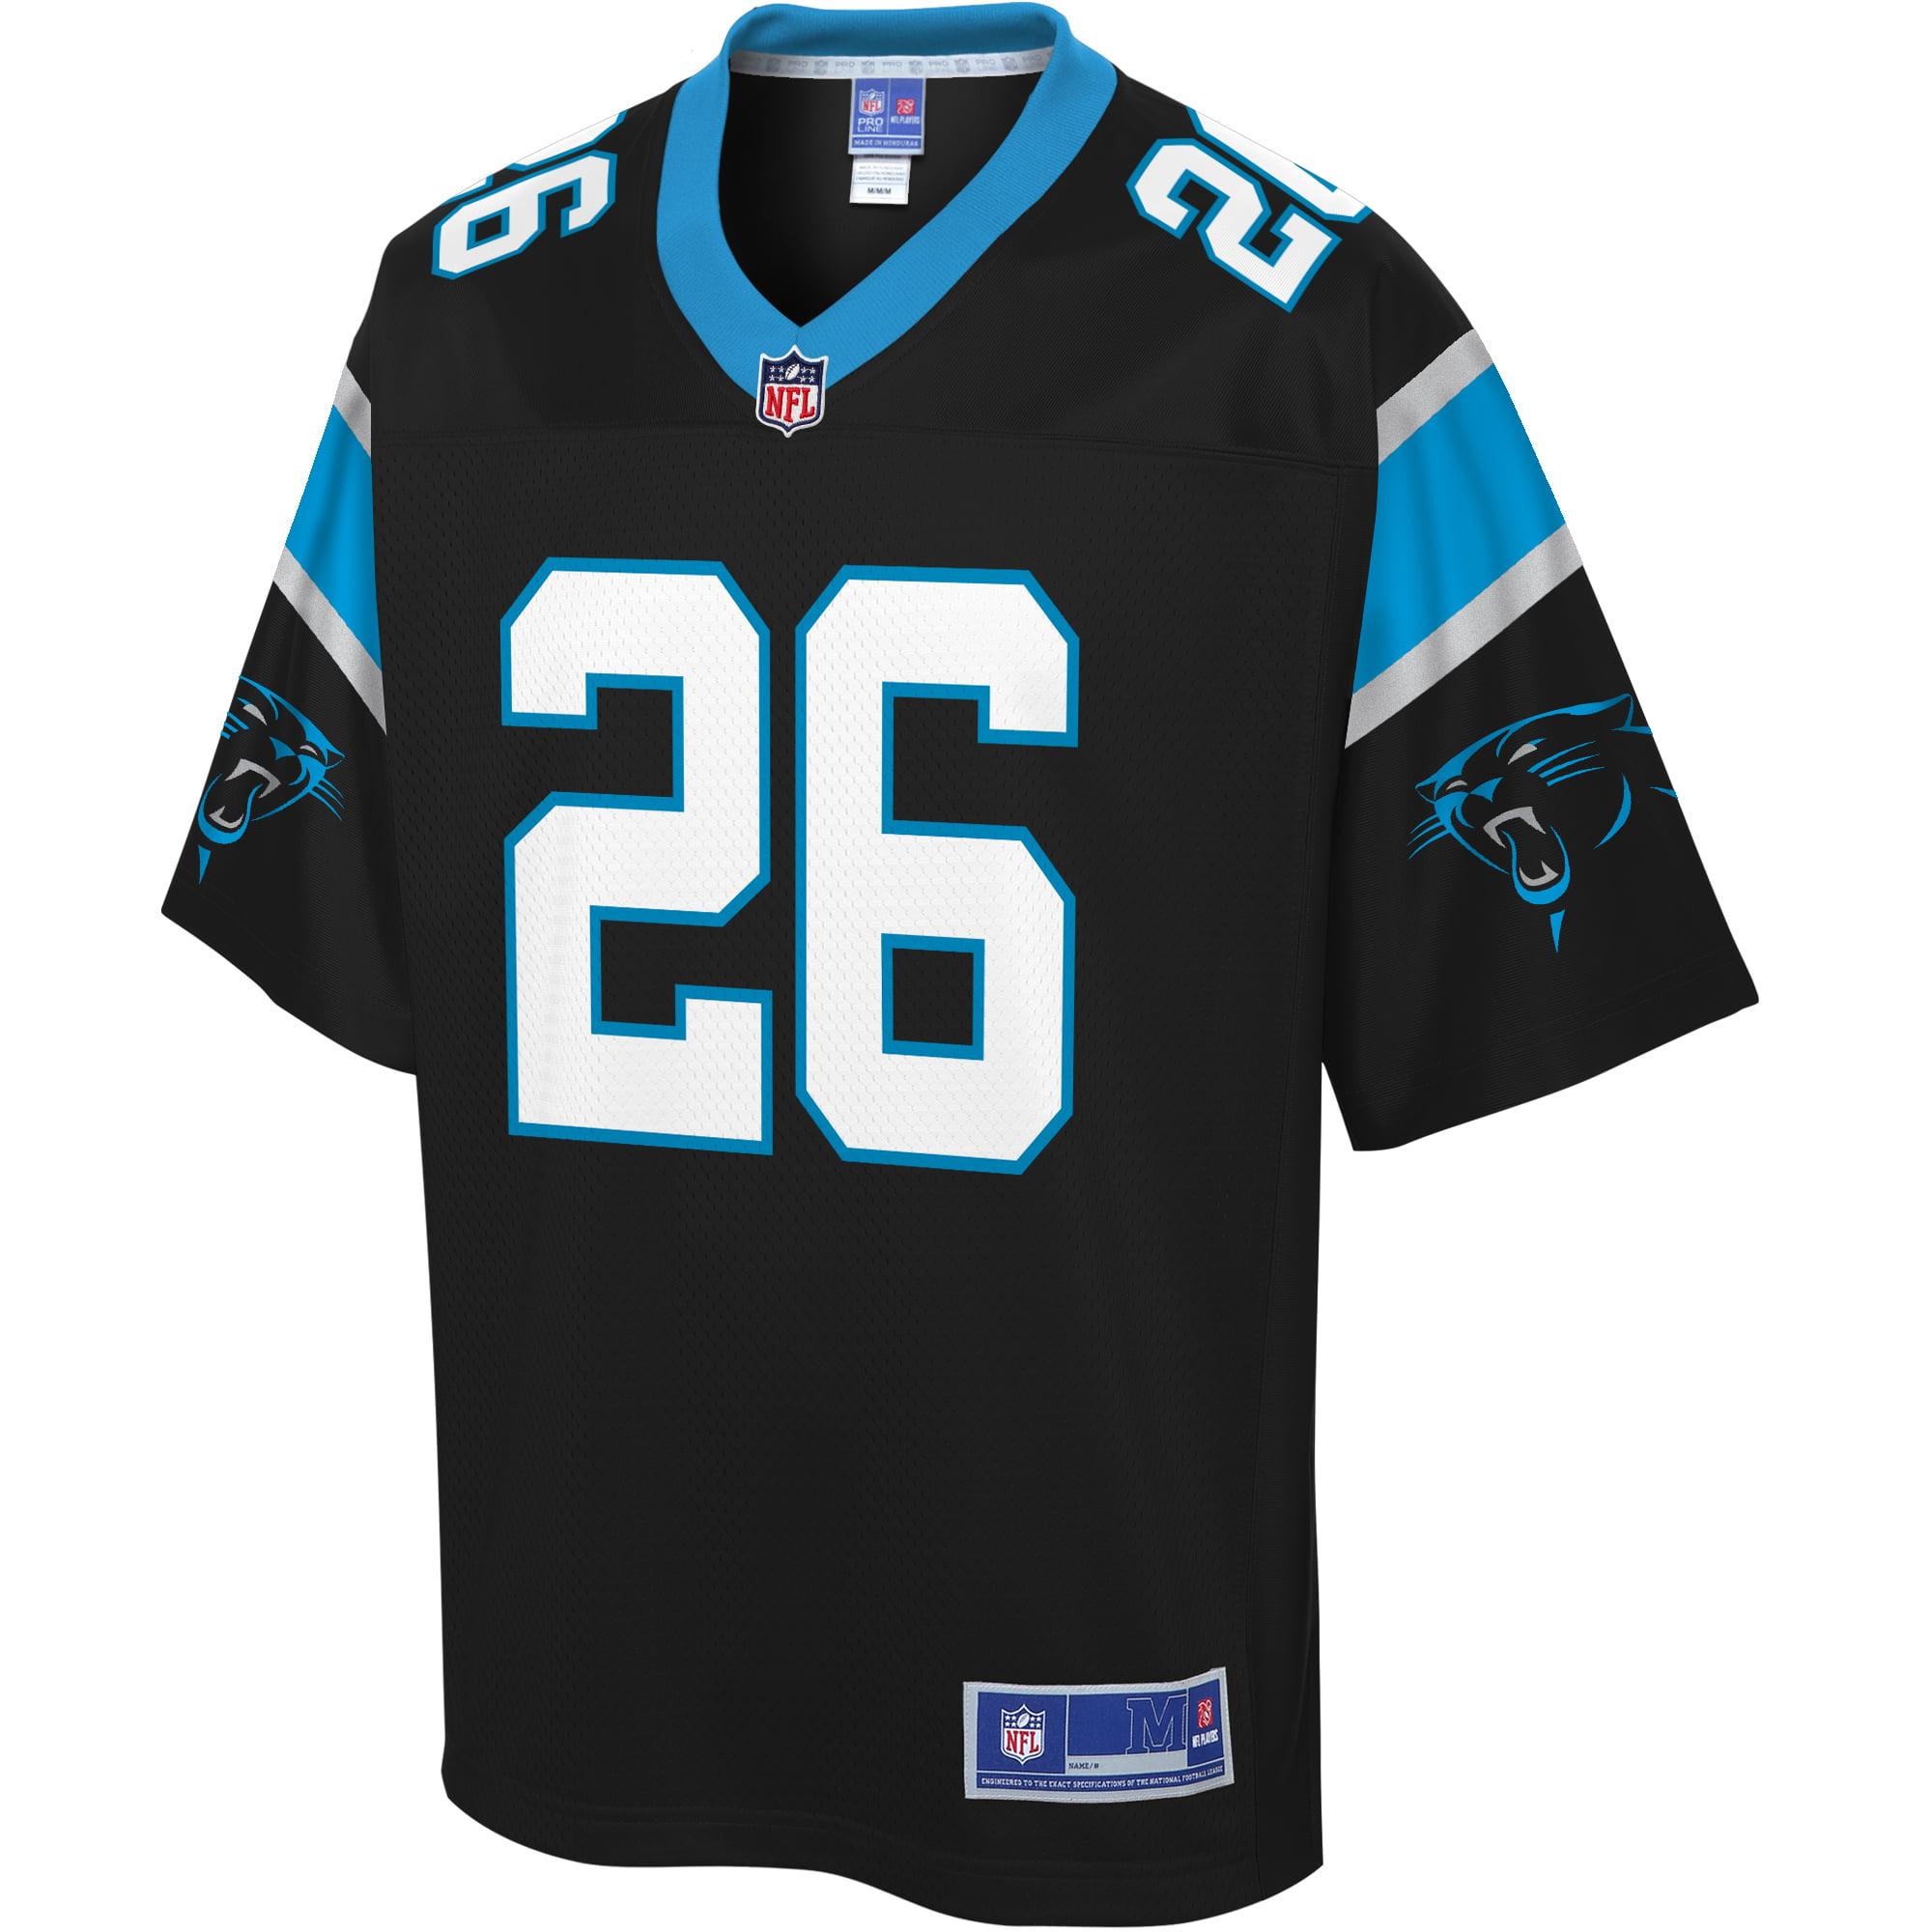 9e91a0a86 Donte Jackson Carolina Panthers NFL Pro Line Big & Tall Player ...